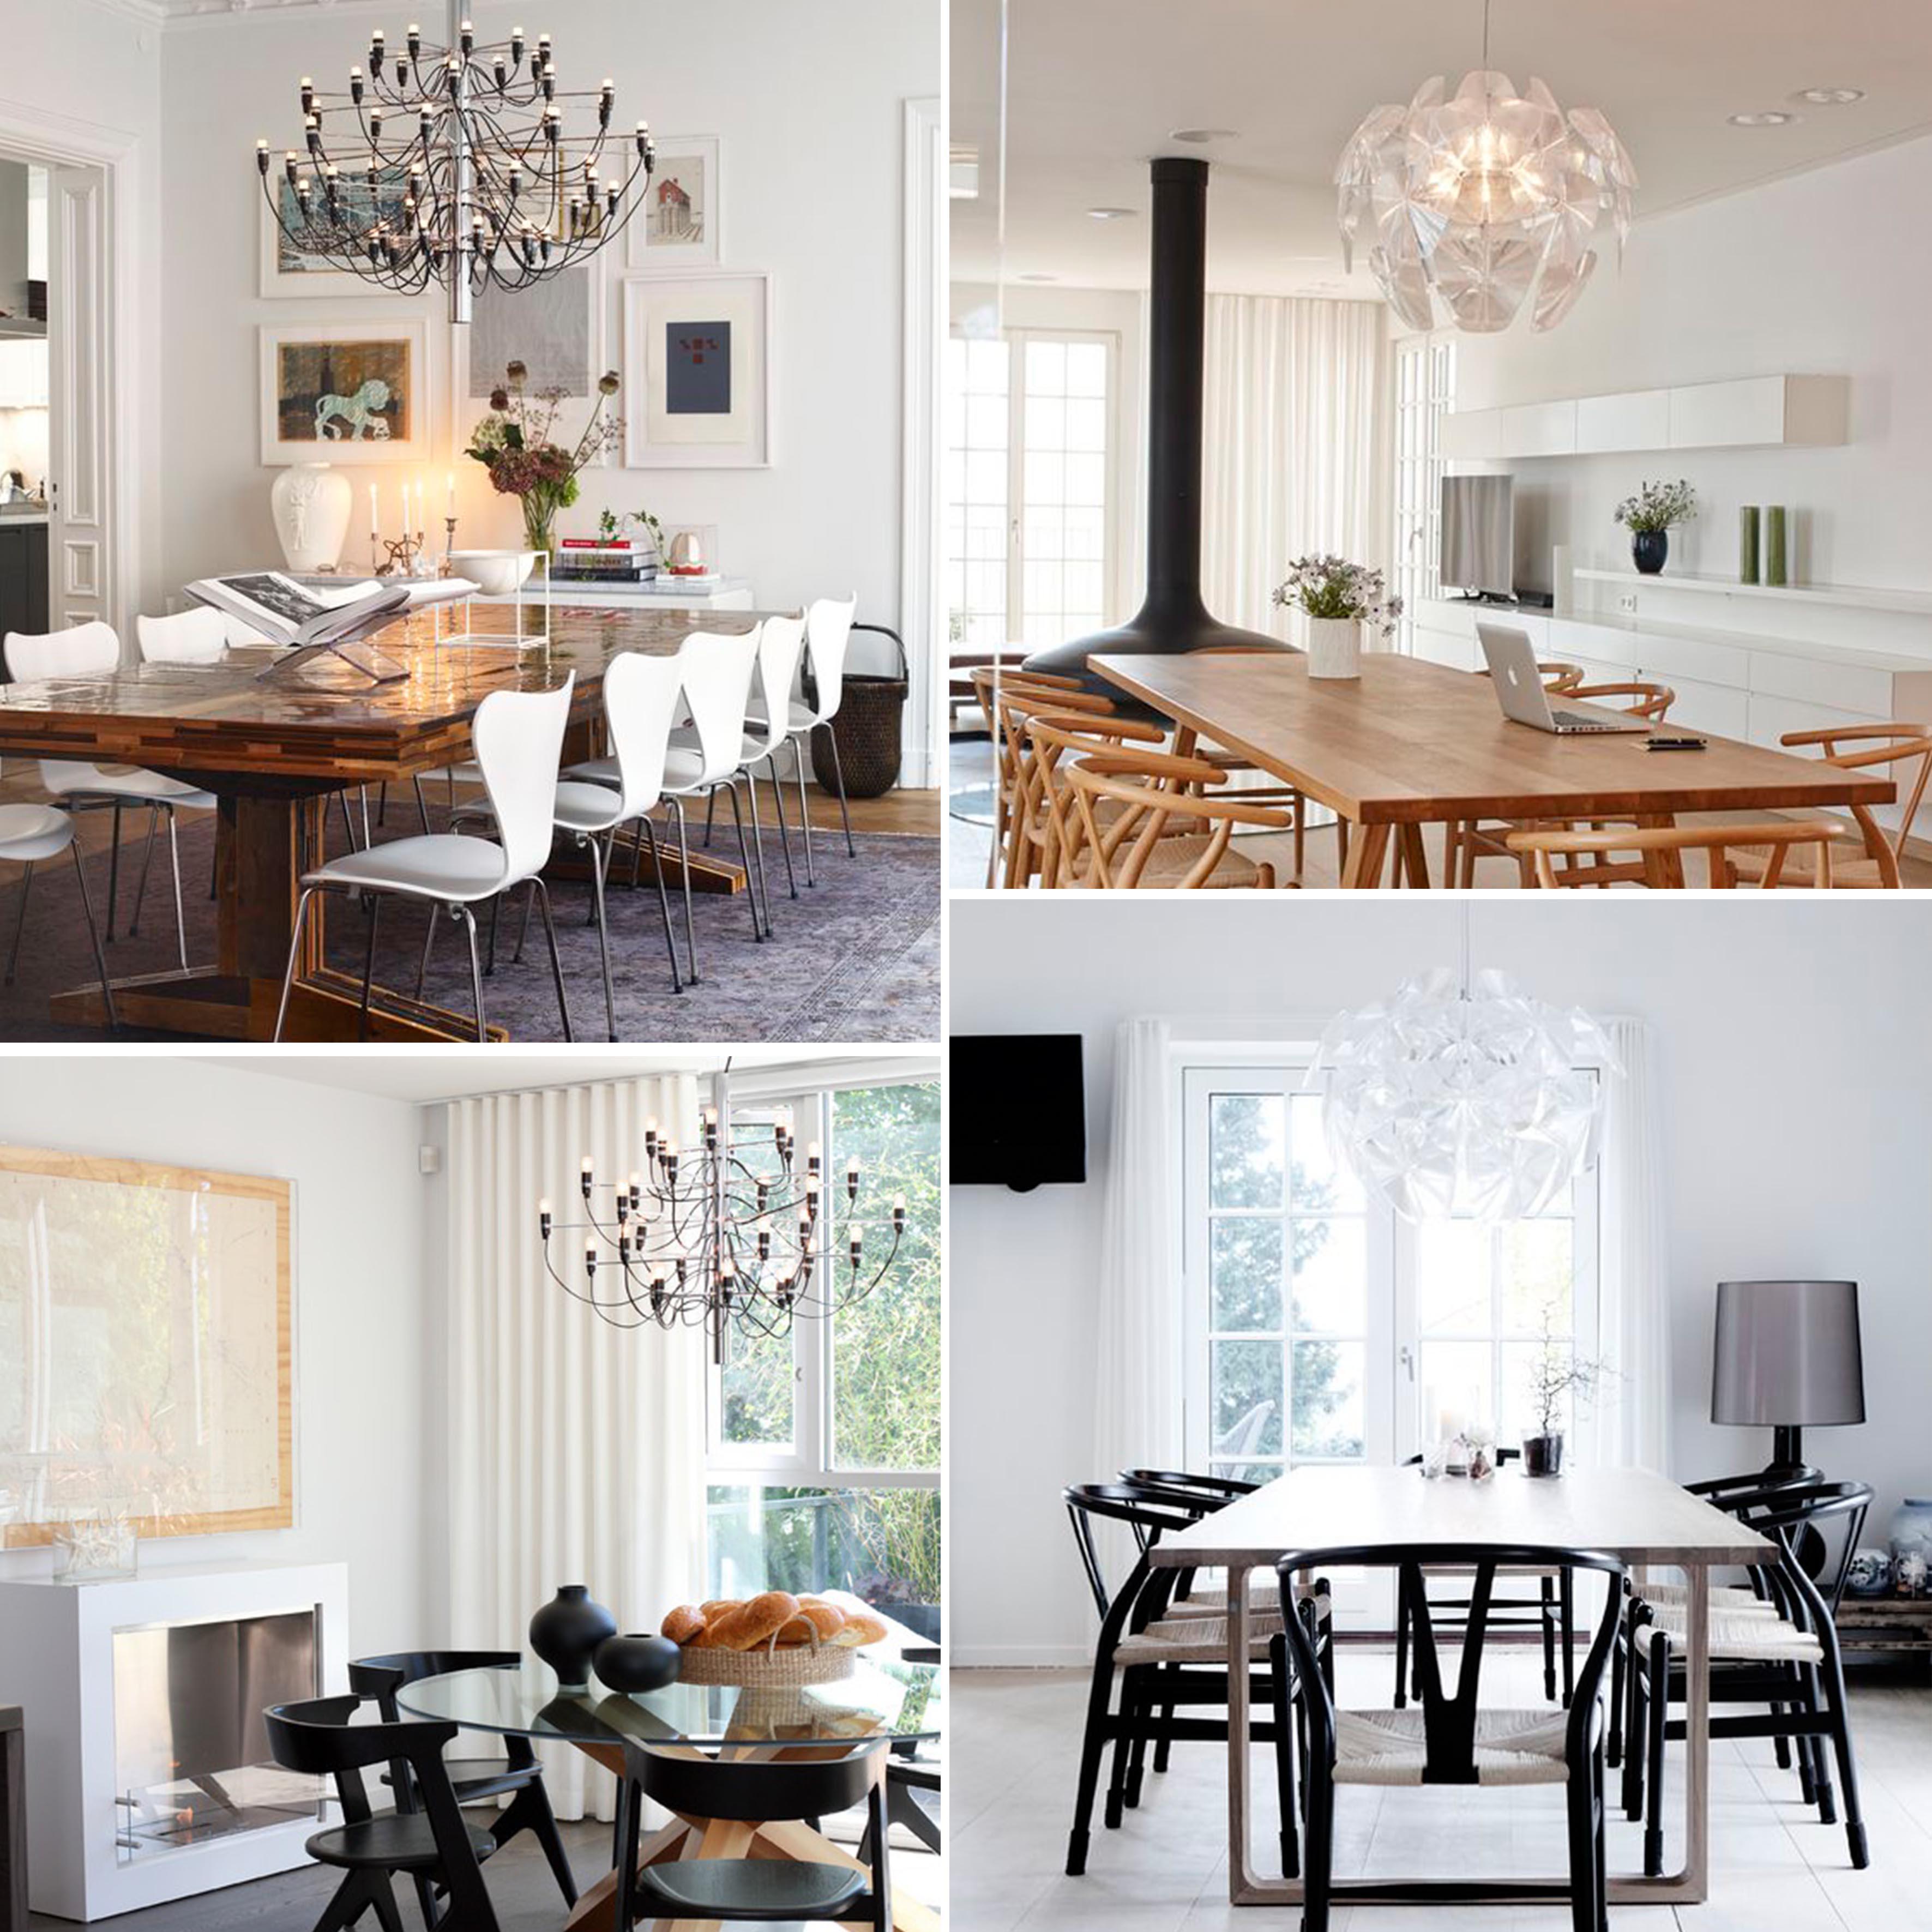 Lampade Sopra Tavolo Da Pranzo how to choose the lights: the living-room | sleek tips